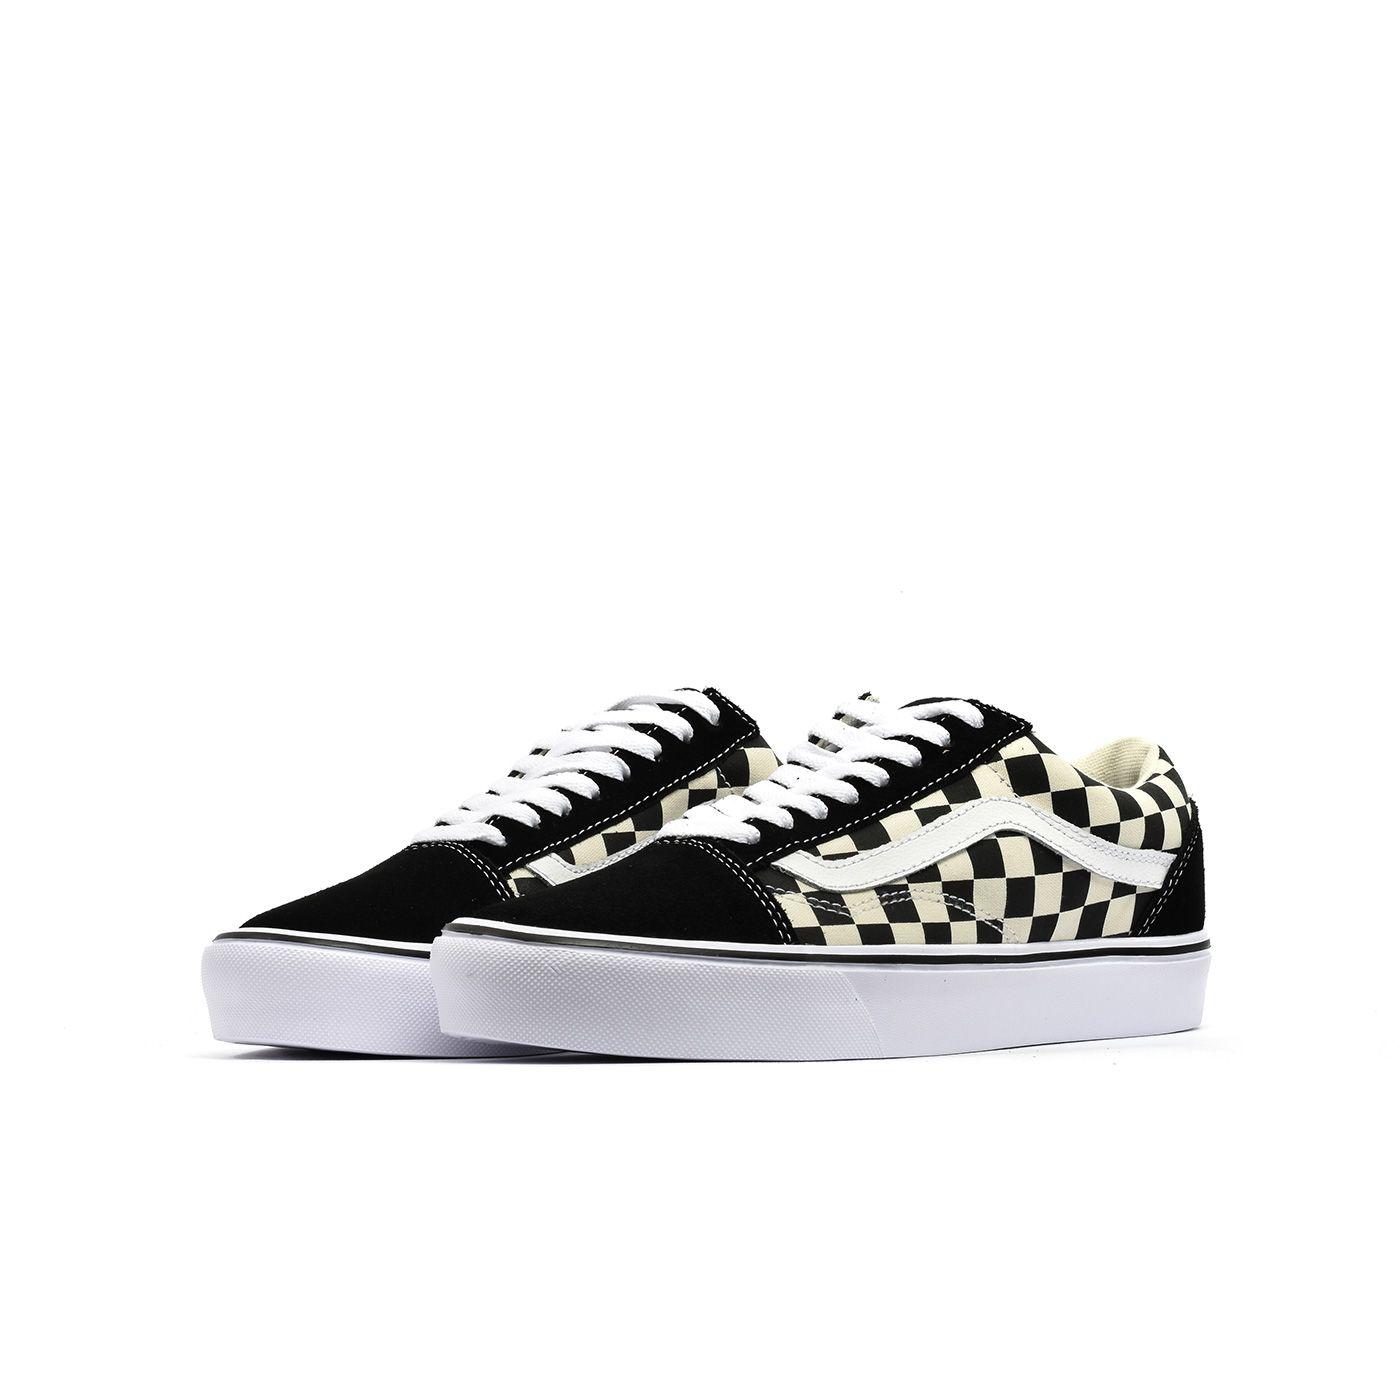 Vans Old Skool Lite Checkerboard Xtreme Pt